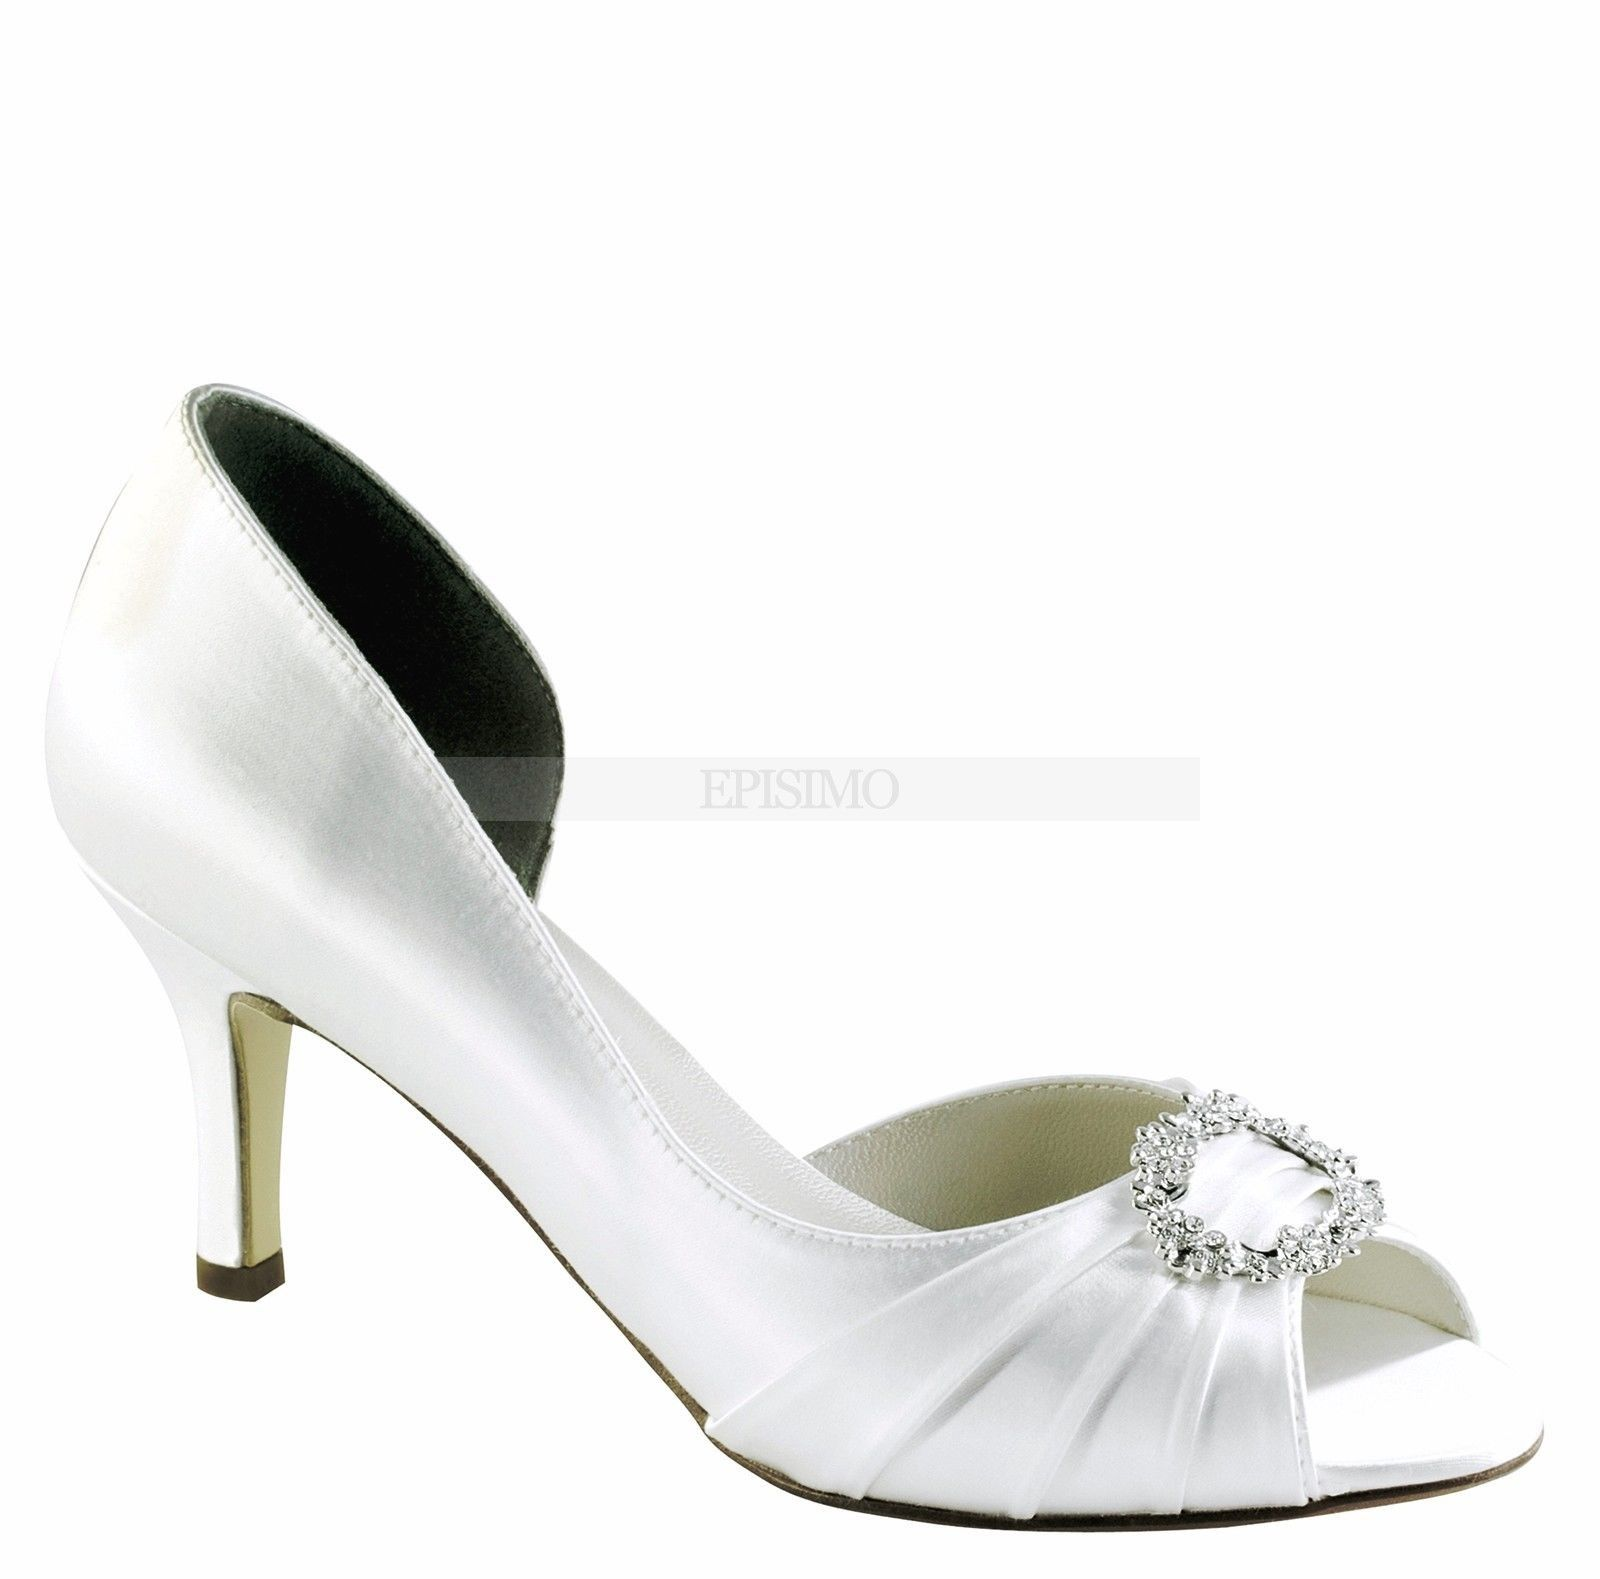 ee19af4852b Νυφικά παπούτσια Ivanna - Touch Ups. Βρείτε αυτό το pin και πολλά ακόμα  στον πίνακα wedding ...